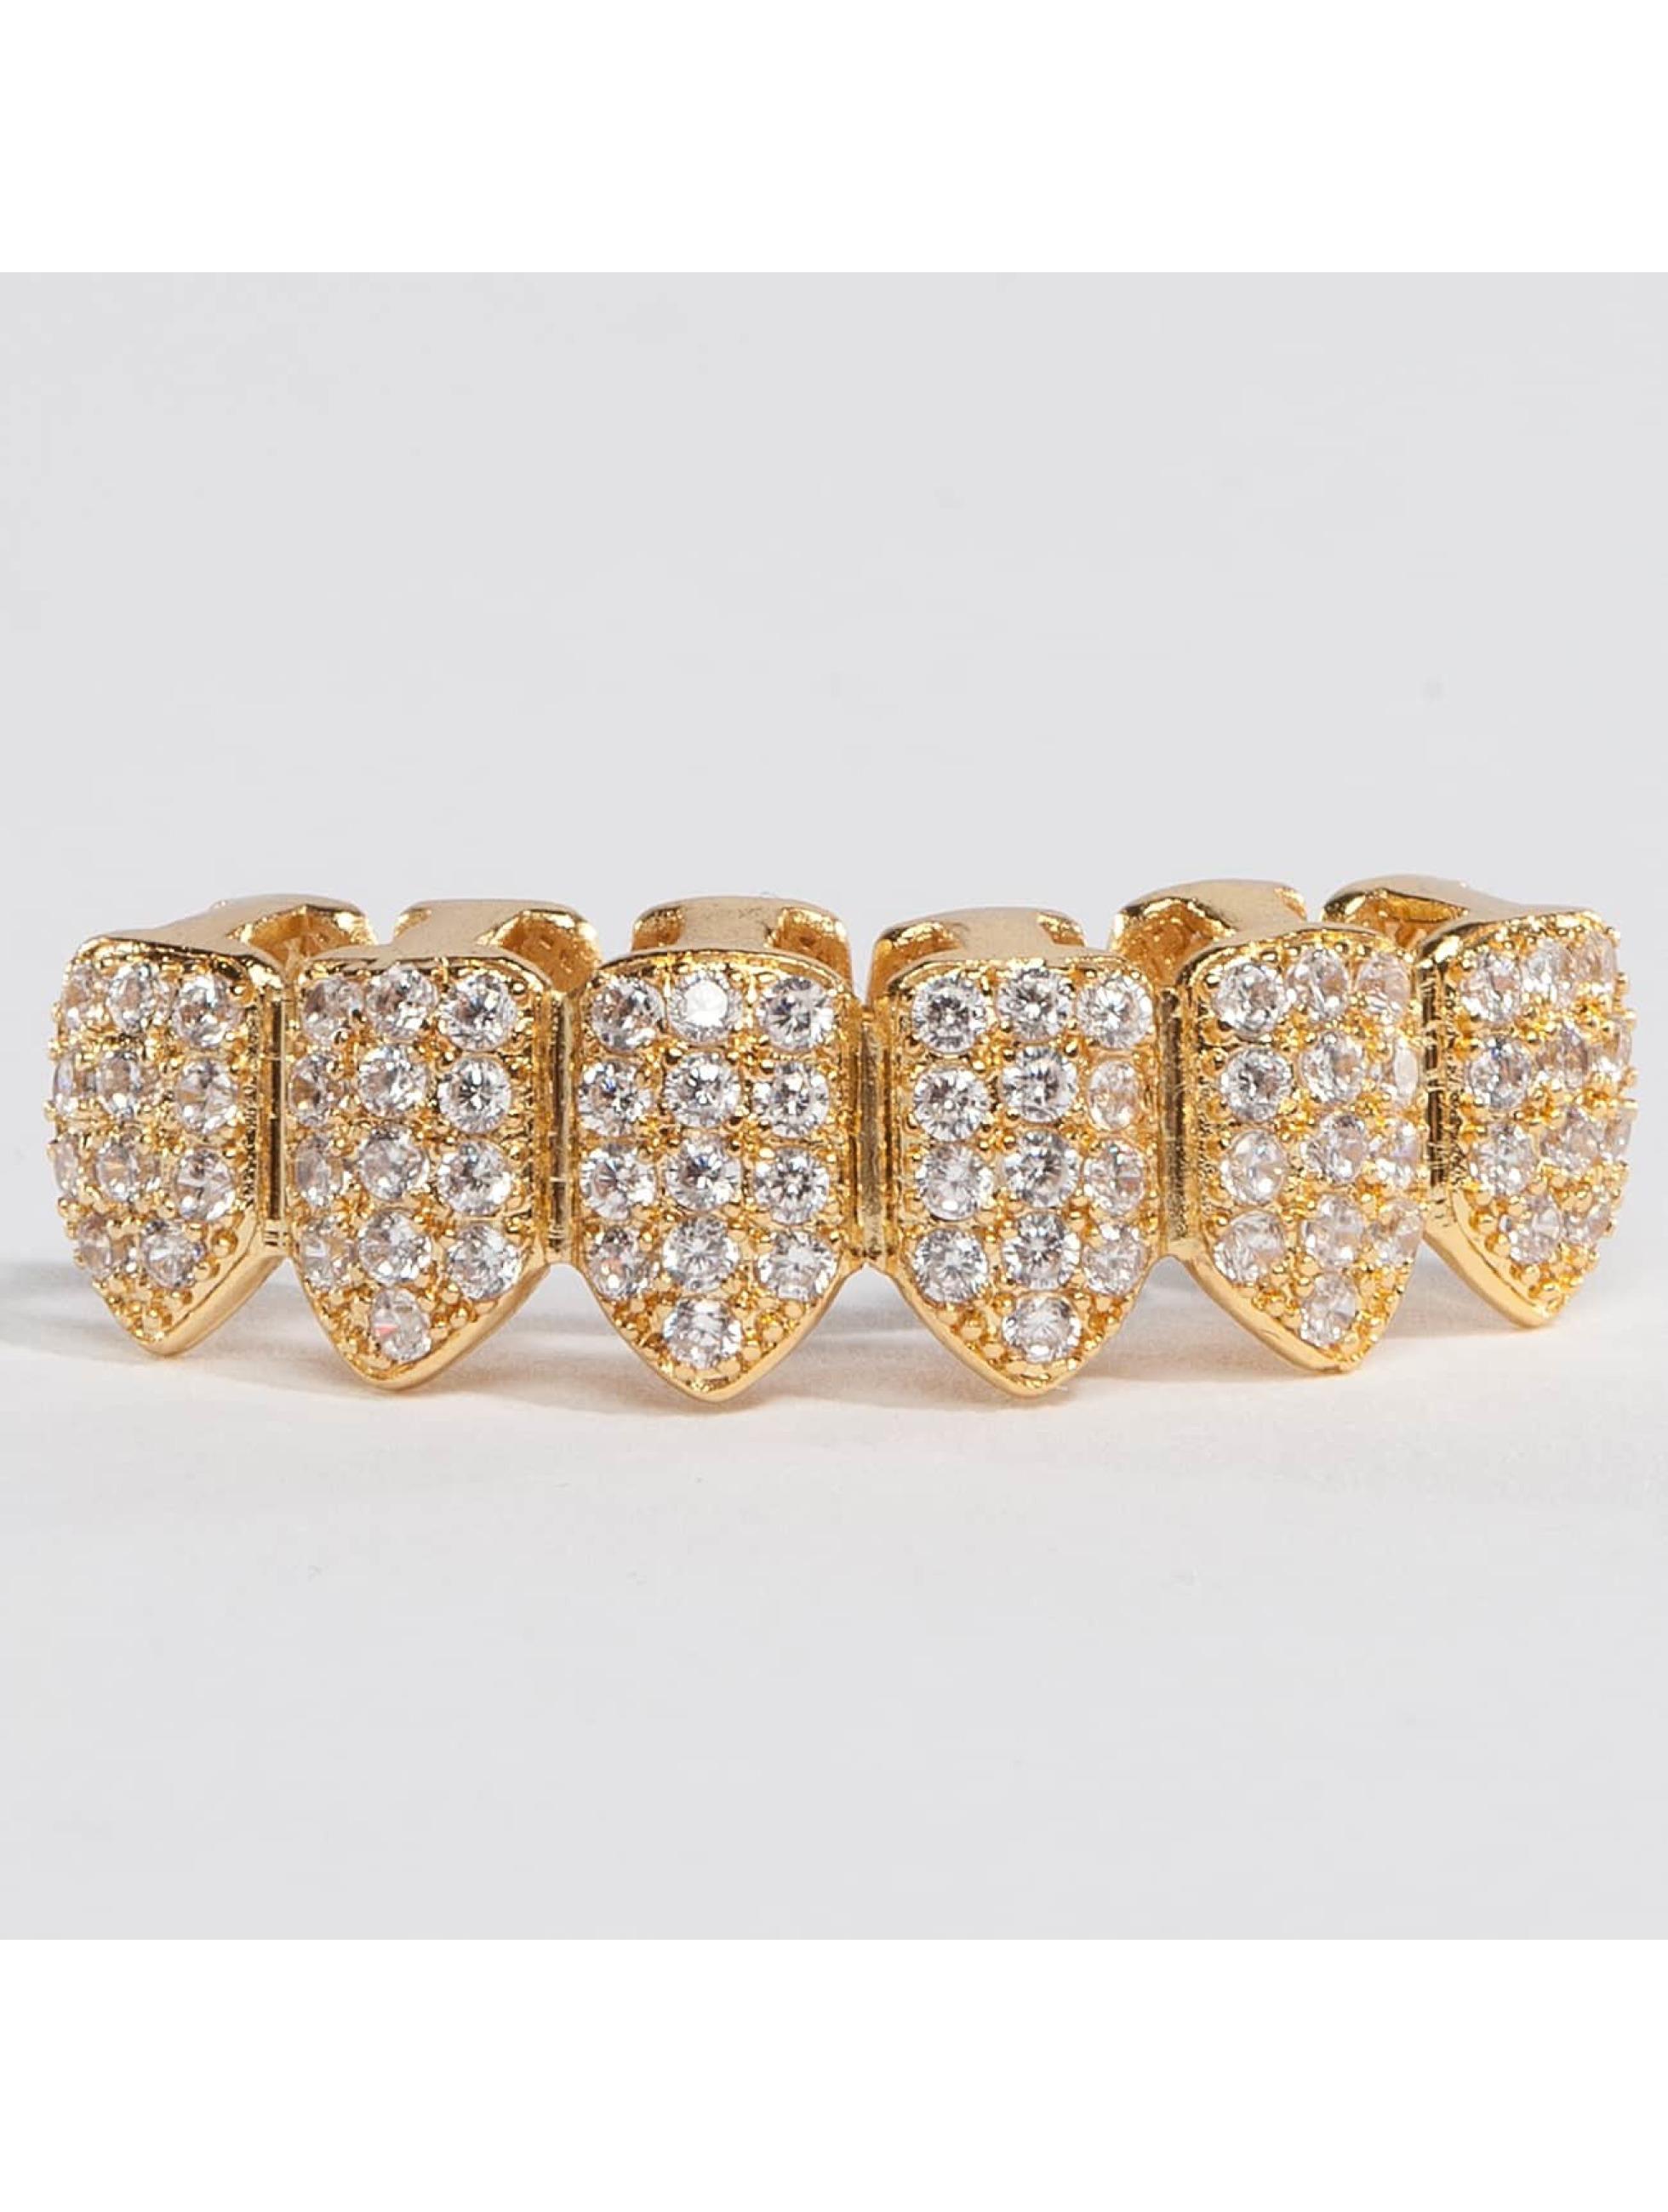 KING ICE Overige Gold_Plated CZ Studded Teeth Bottom goud